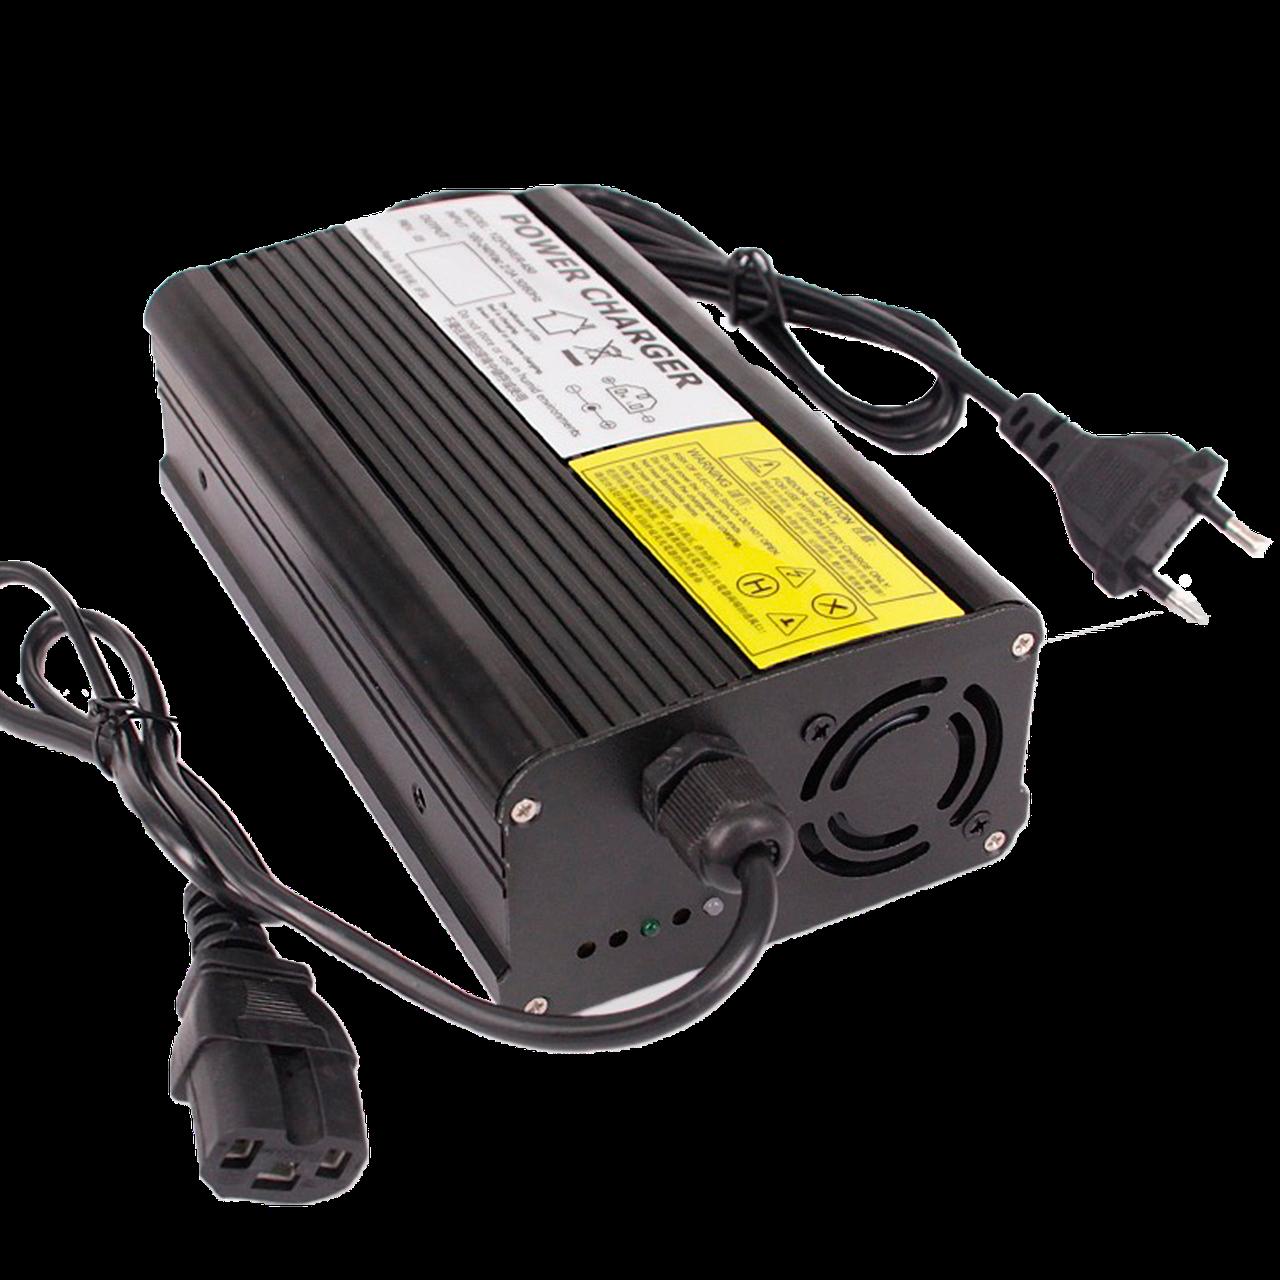 Зарядное устройство для аккумуляторов LiFePO4 24V (28.8V)-10A-240W